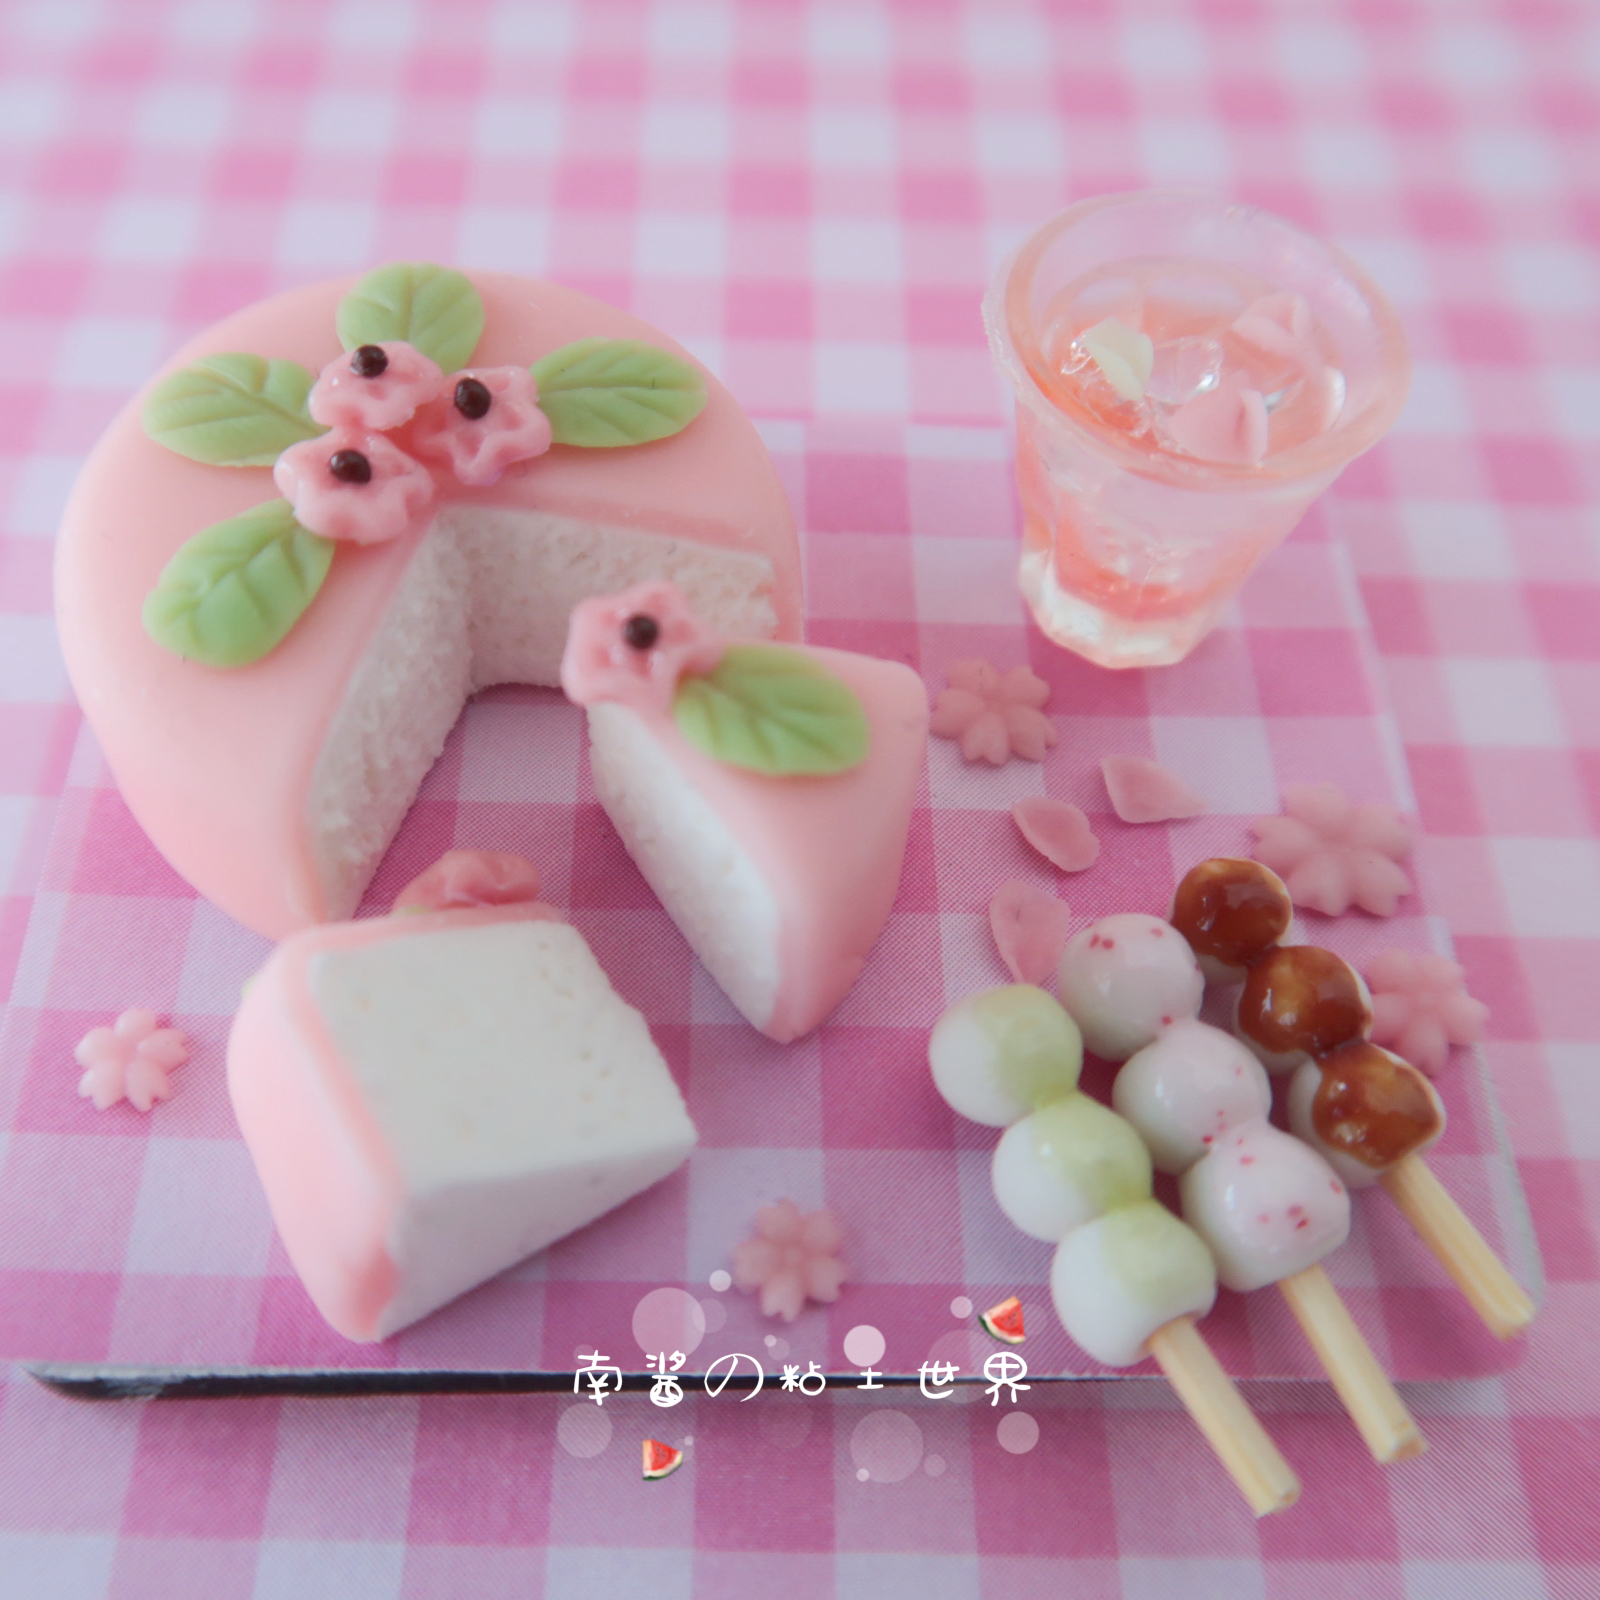 New miniature mini food and play handmade Sakura cake ob11 doll house 12 distribution BJD Japanese Kitchen